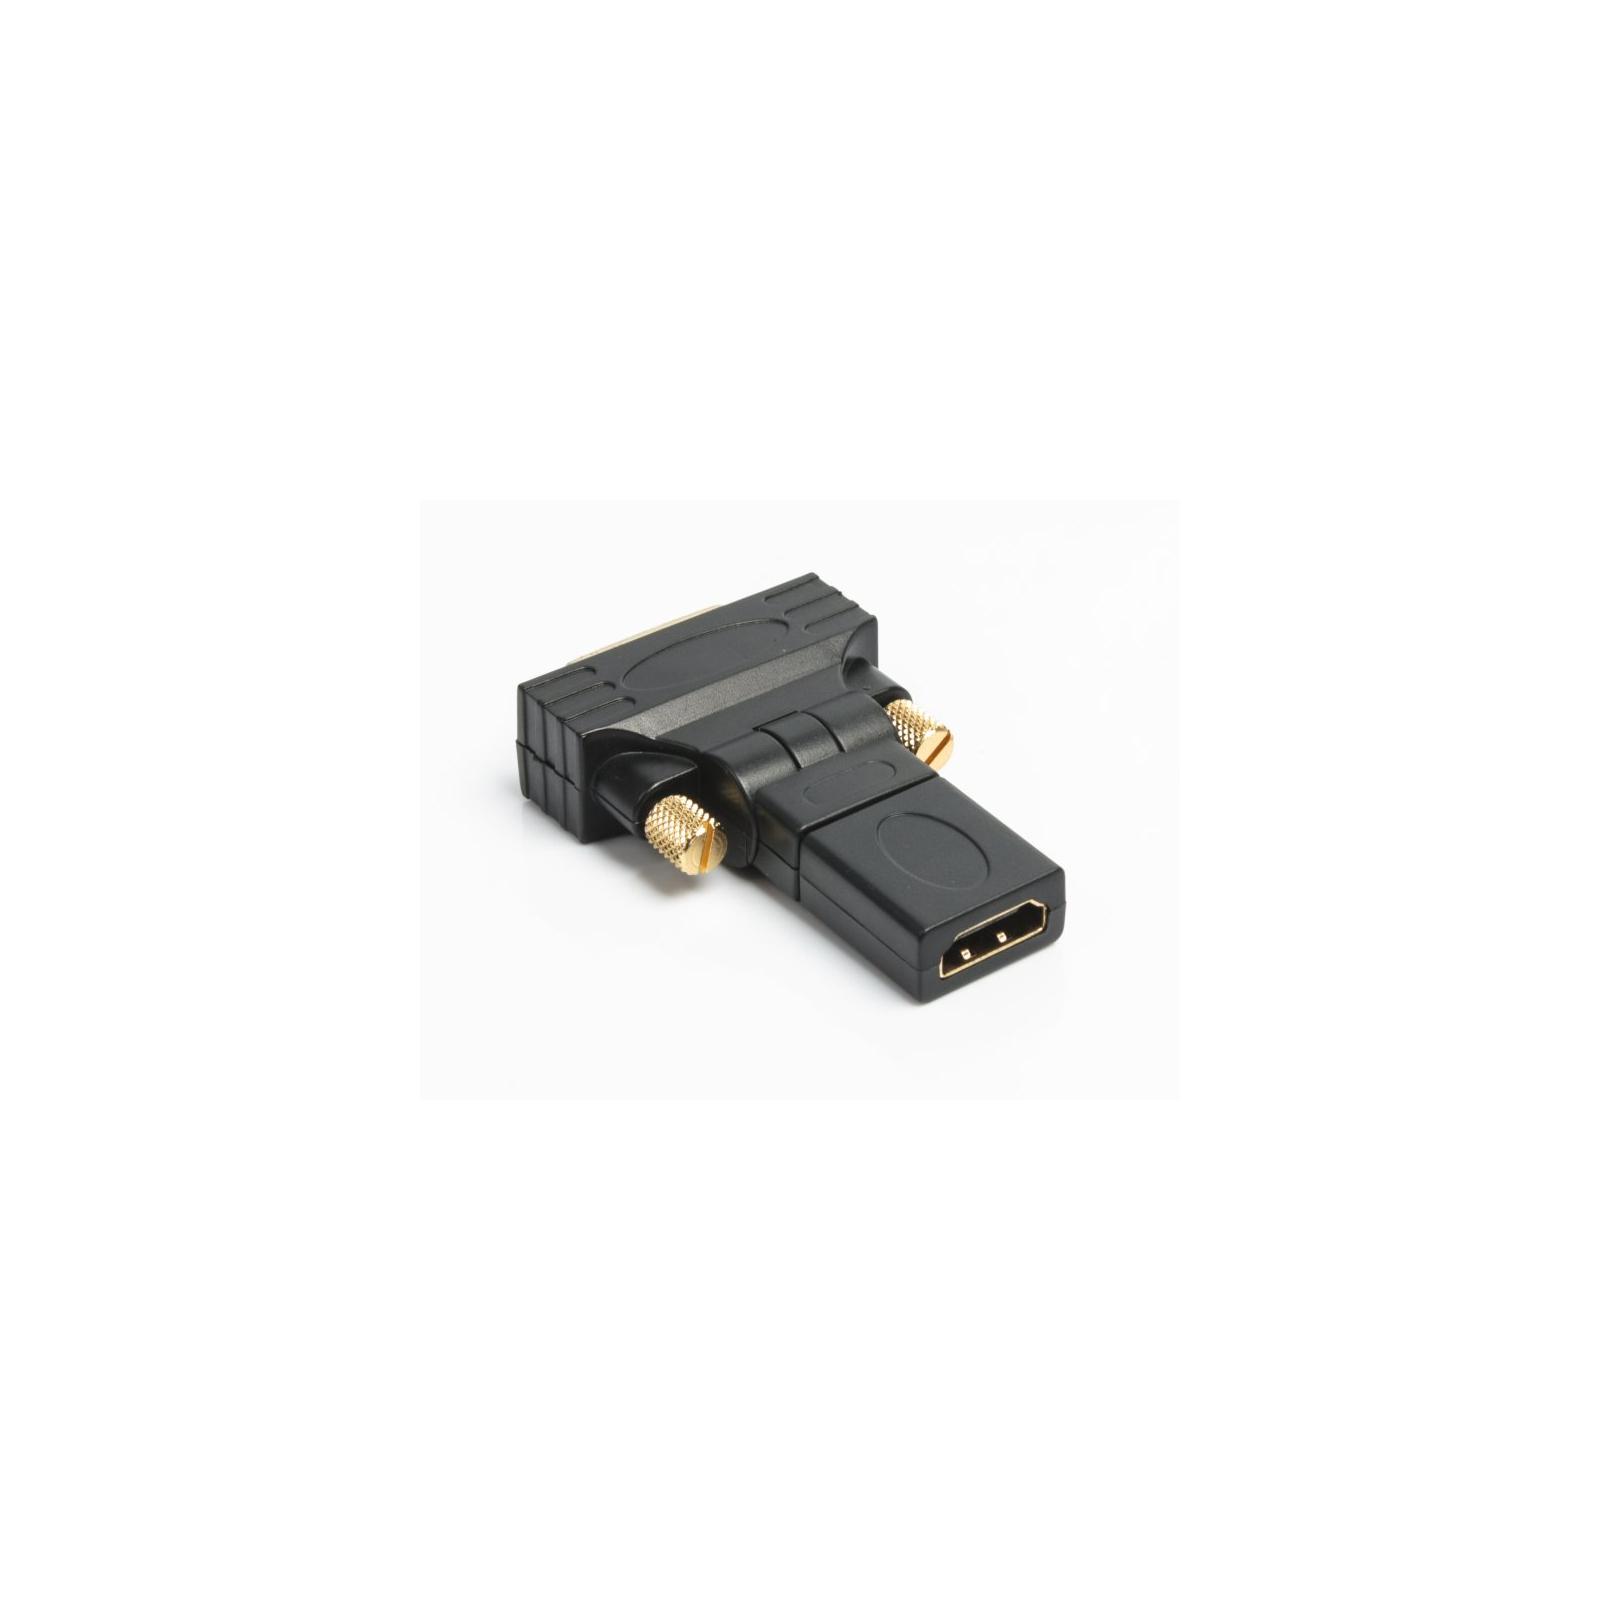 Переходник HDMI AF to DVI M (24+1) Viewcon (VD 038 B) изображение 2